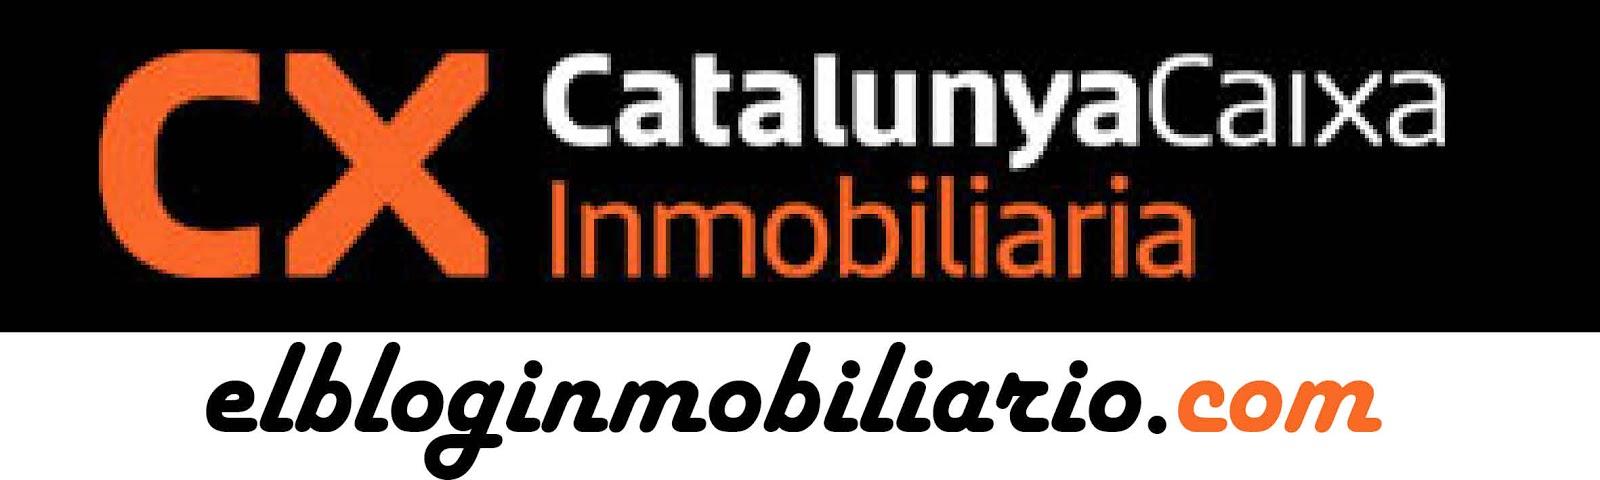 CX CatalunyaCaixa Inmobiliaria elbloginmobiliario.com